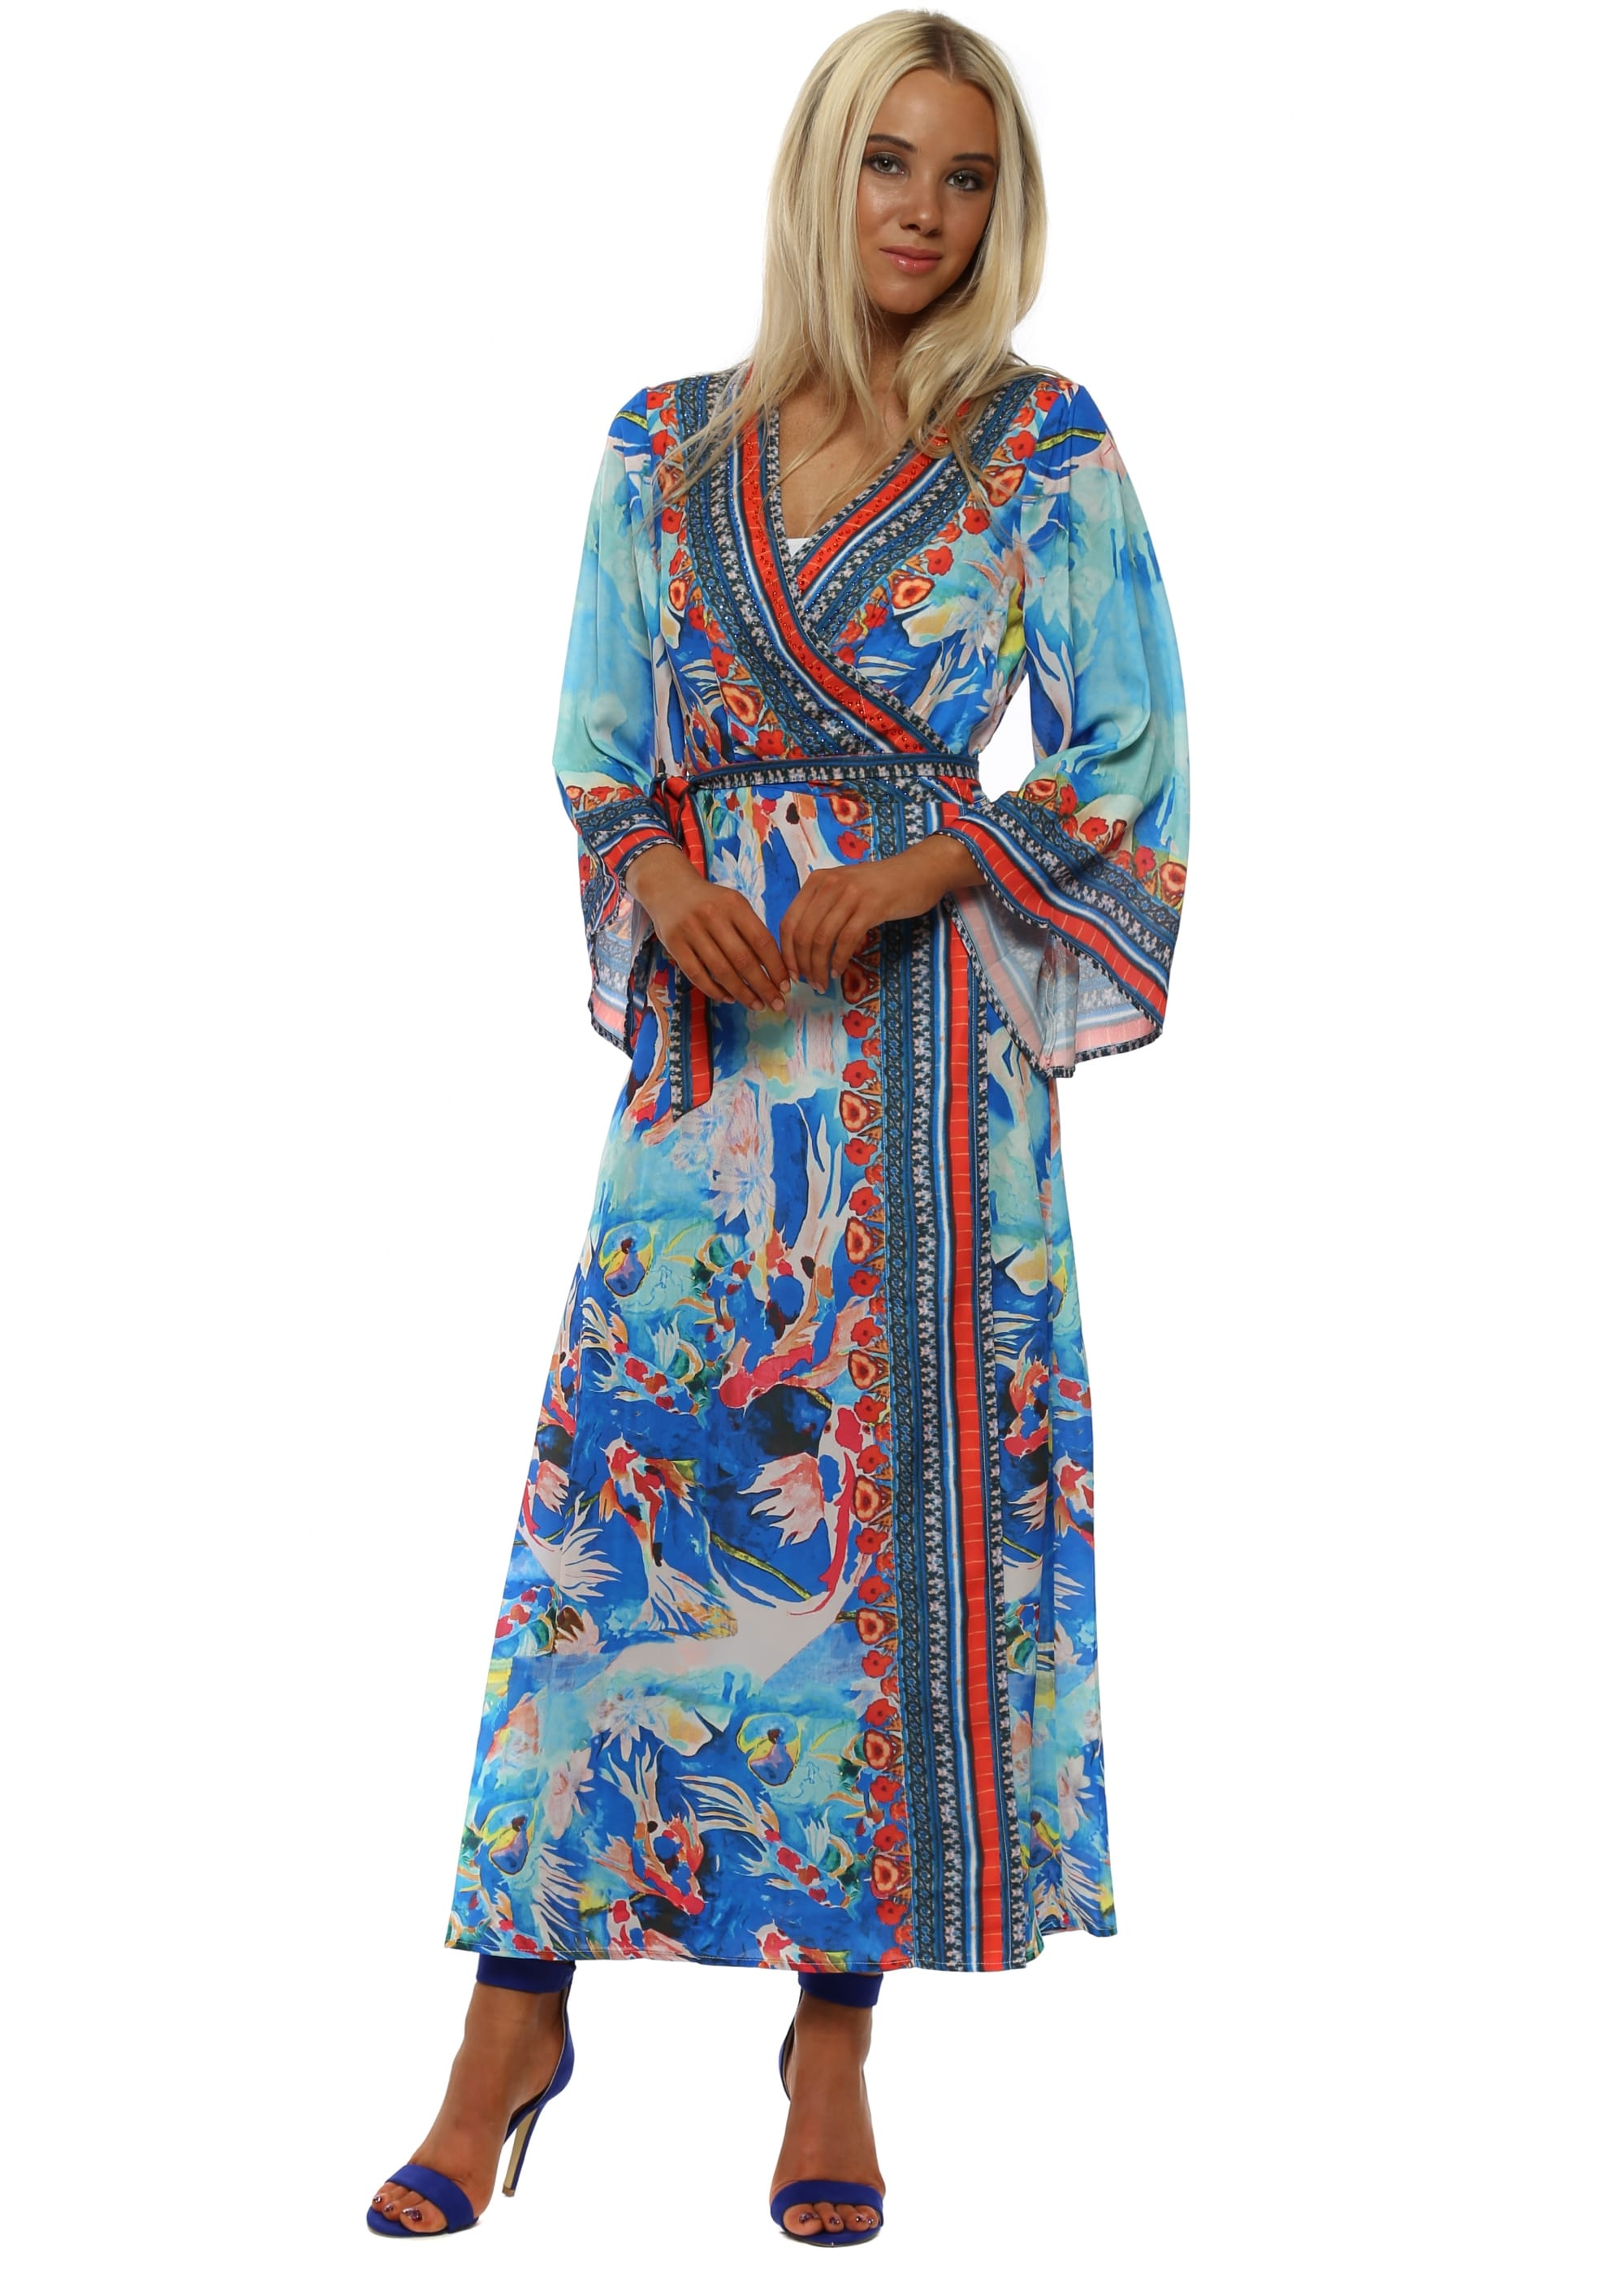 Frime Blue Kimono Maxi Dress